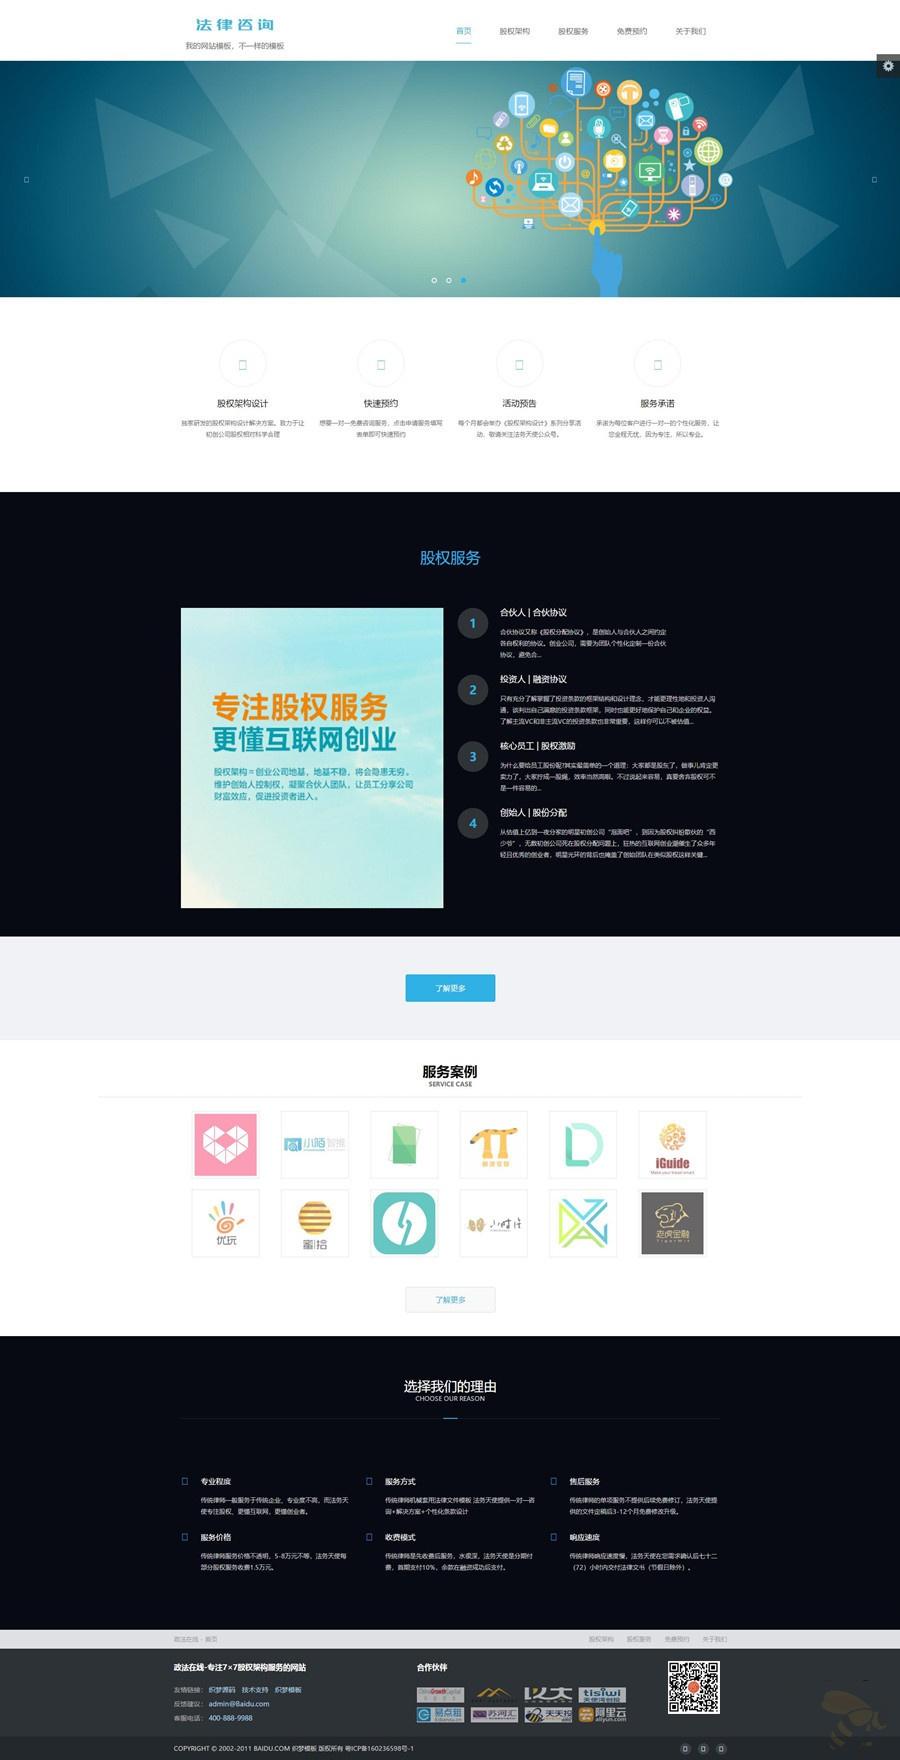 HTML5自适应律师工作室类网站织梦模板(多种颜色切换)